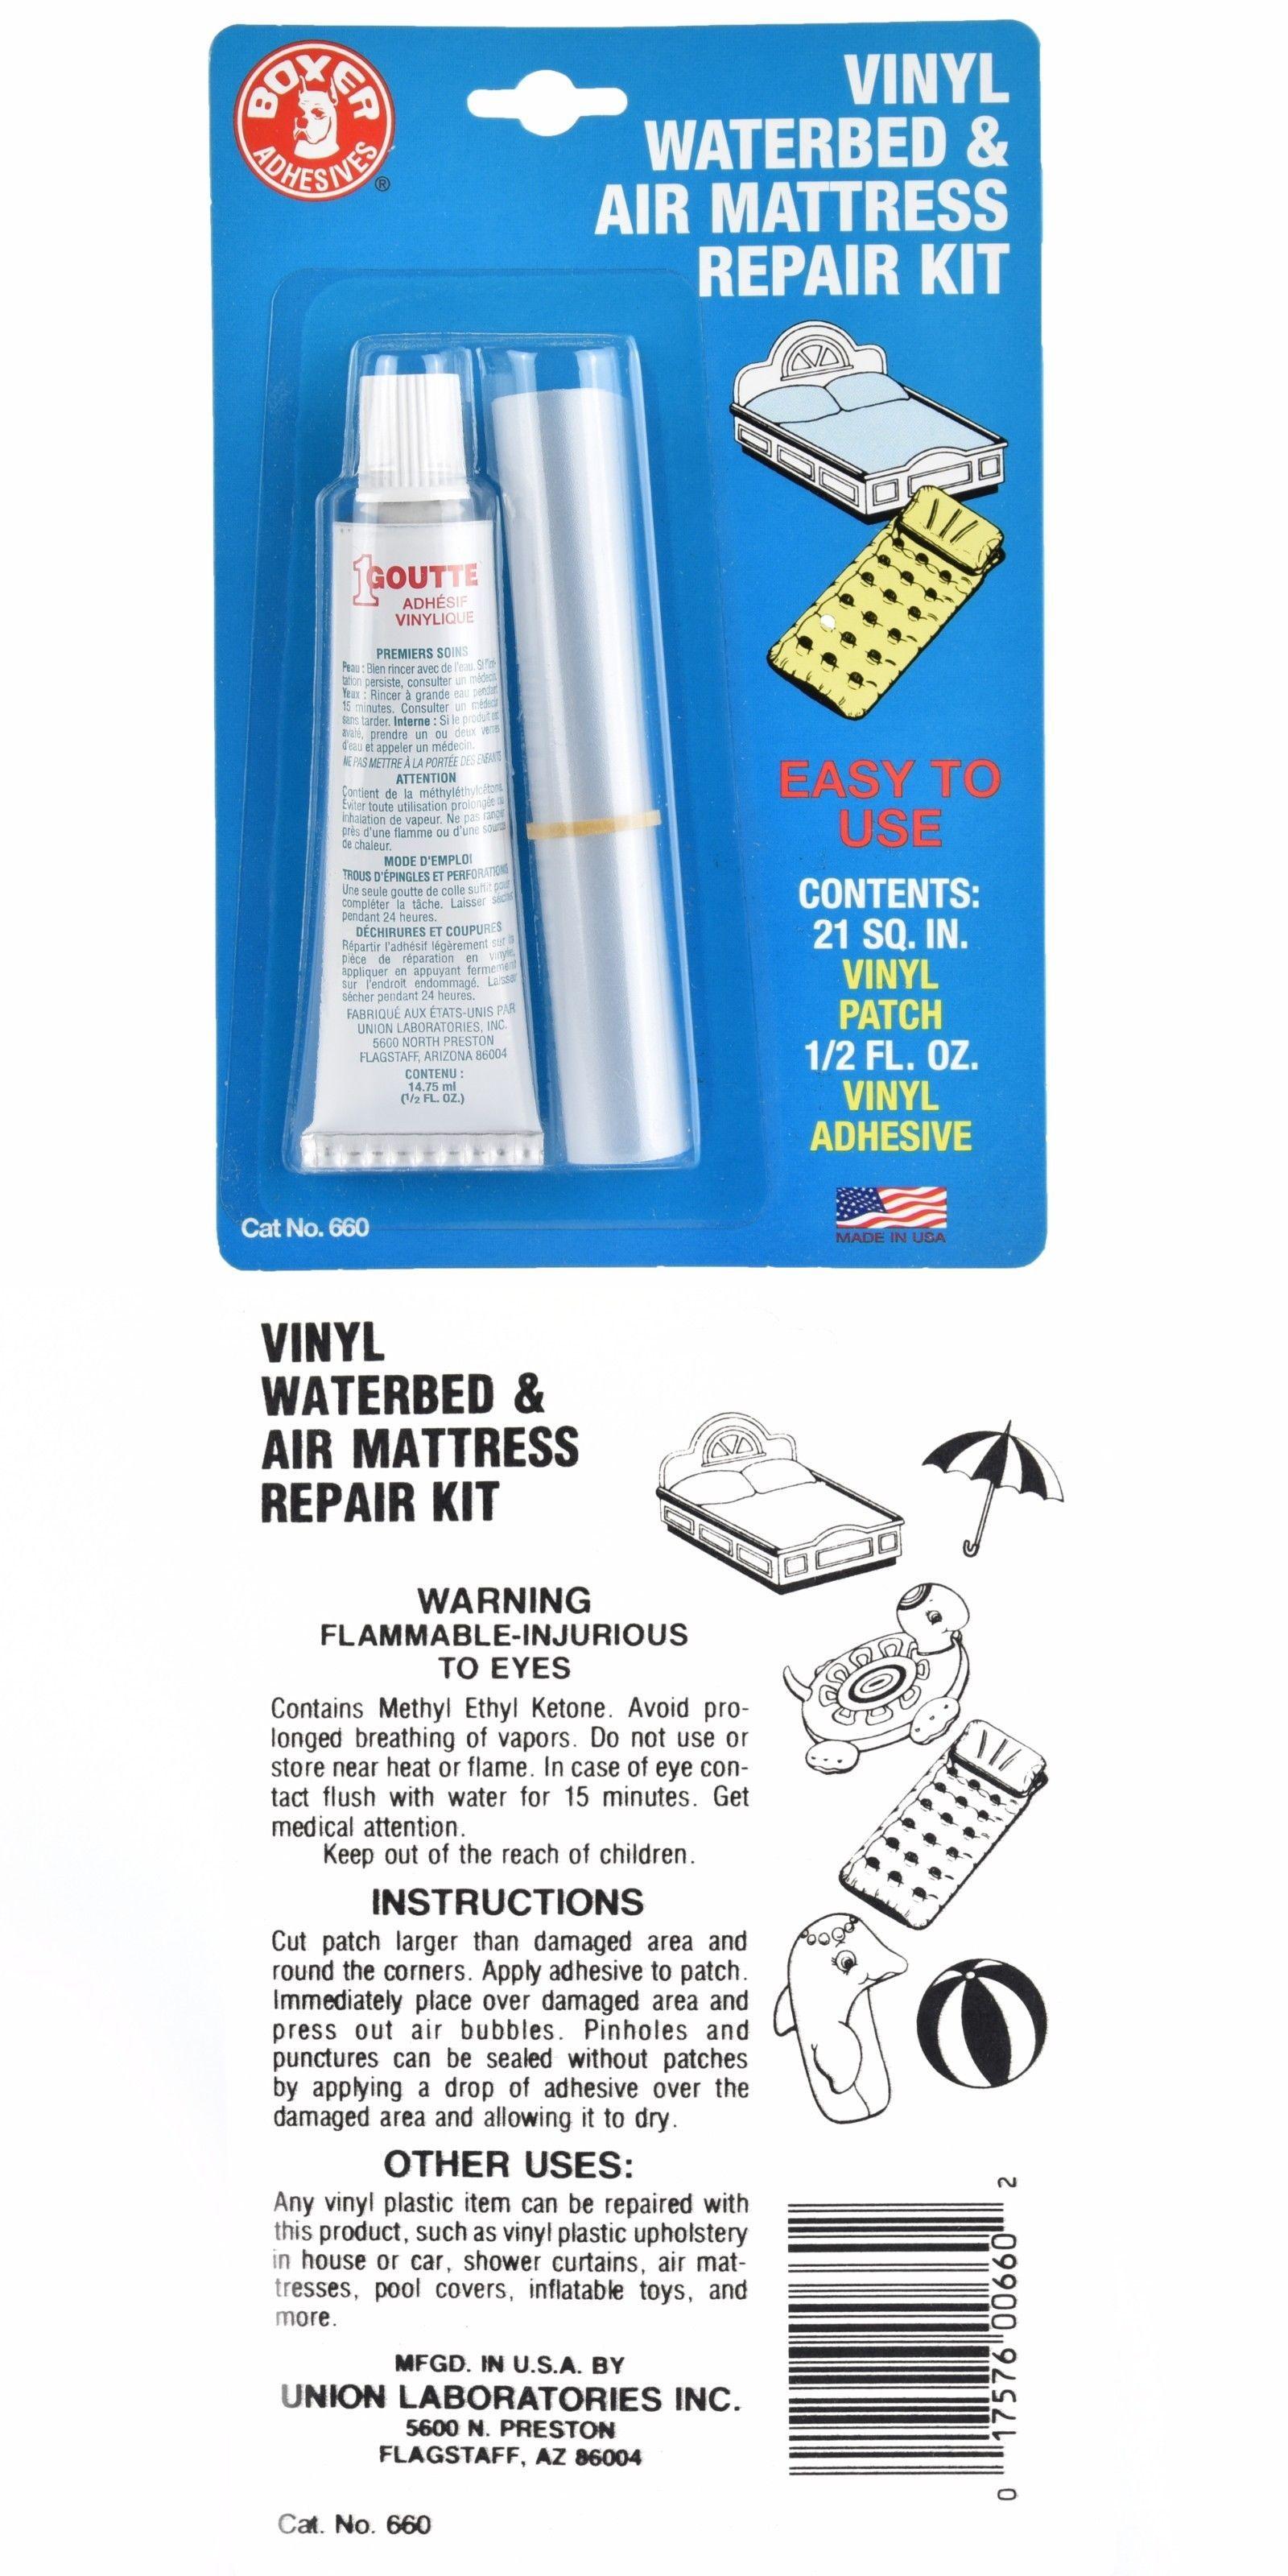 Union Laboratories Boxer Adhesives Vinyl Waterbed Air Mattress Repair Kit Air Mattress Repair Adhesive Vinyl Water Bed